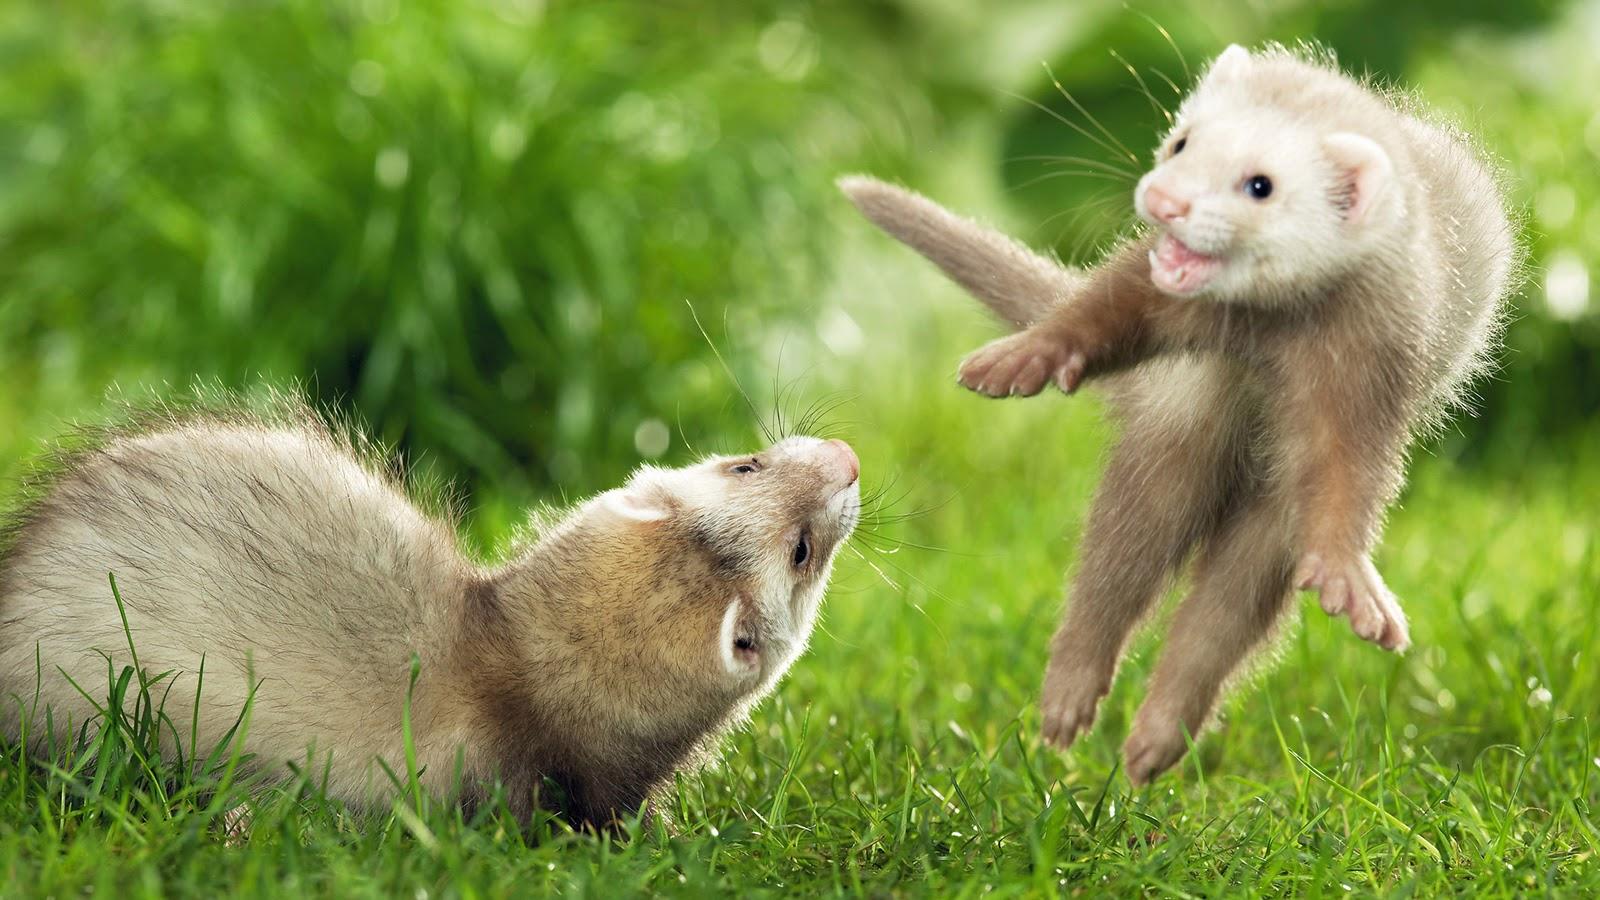 Photography NATURE WORLD PEOPLE BEAUTY: Cute Animals HD Photos Beautiful Animals